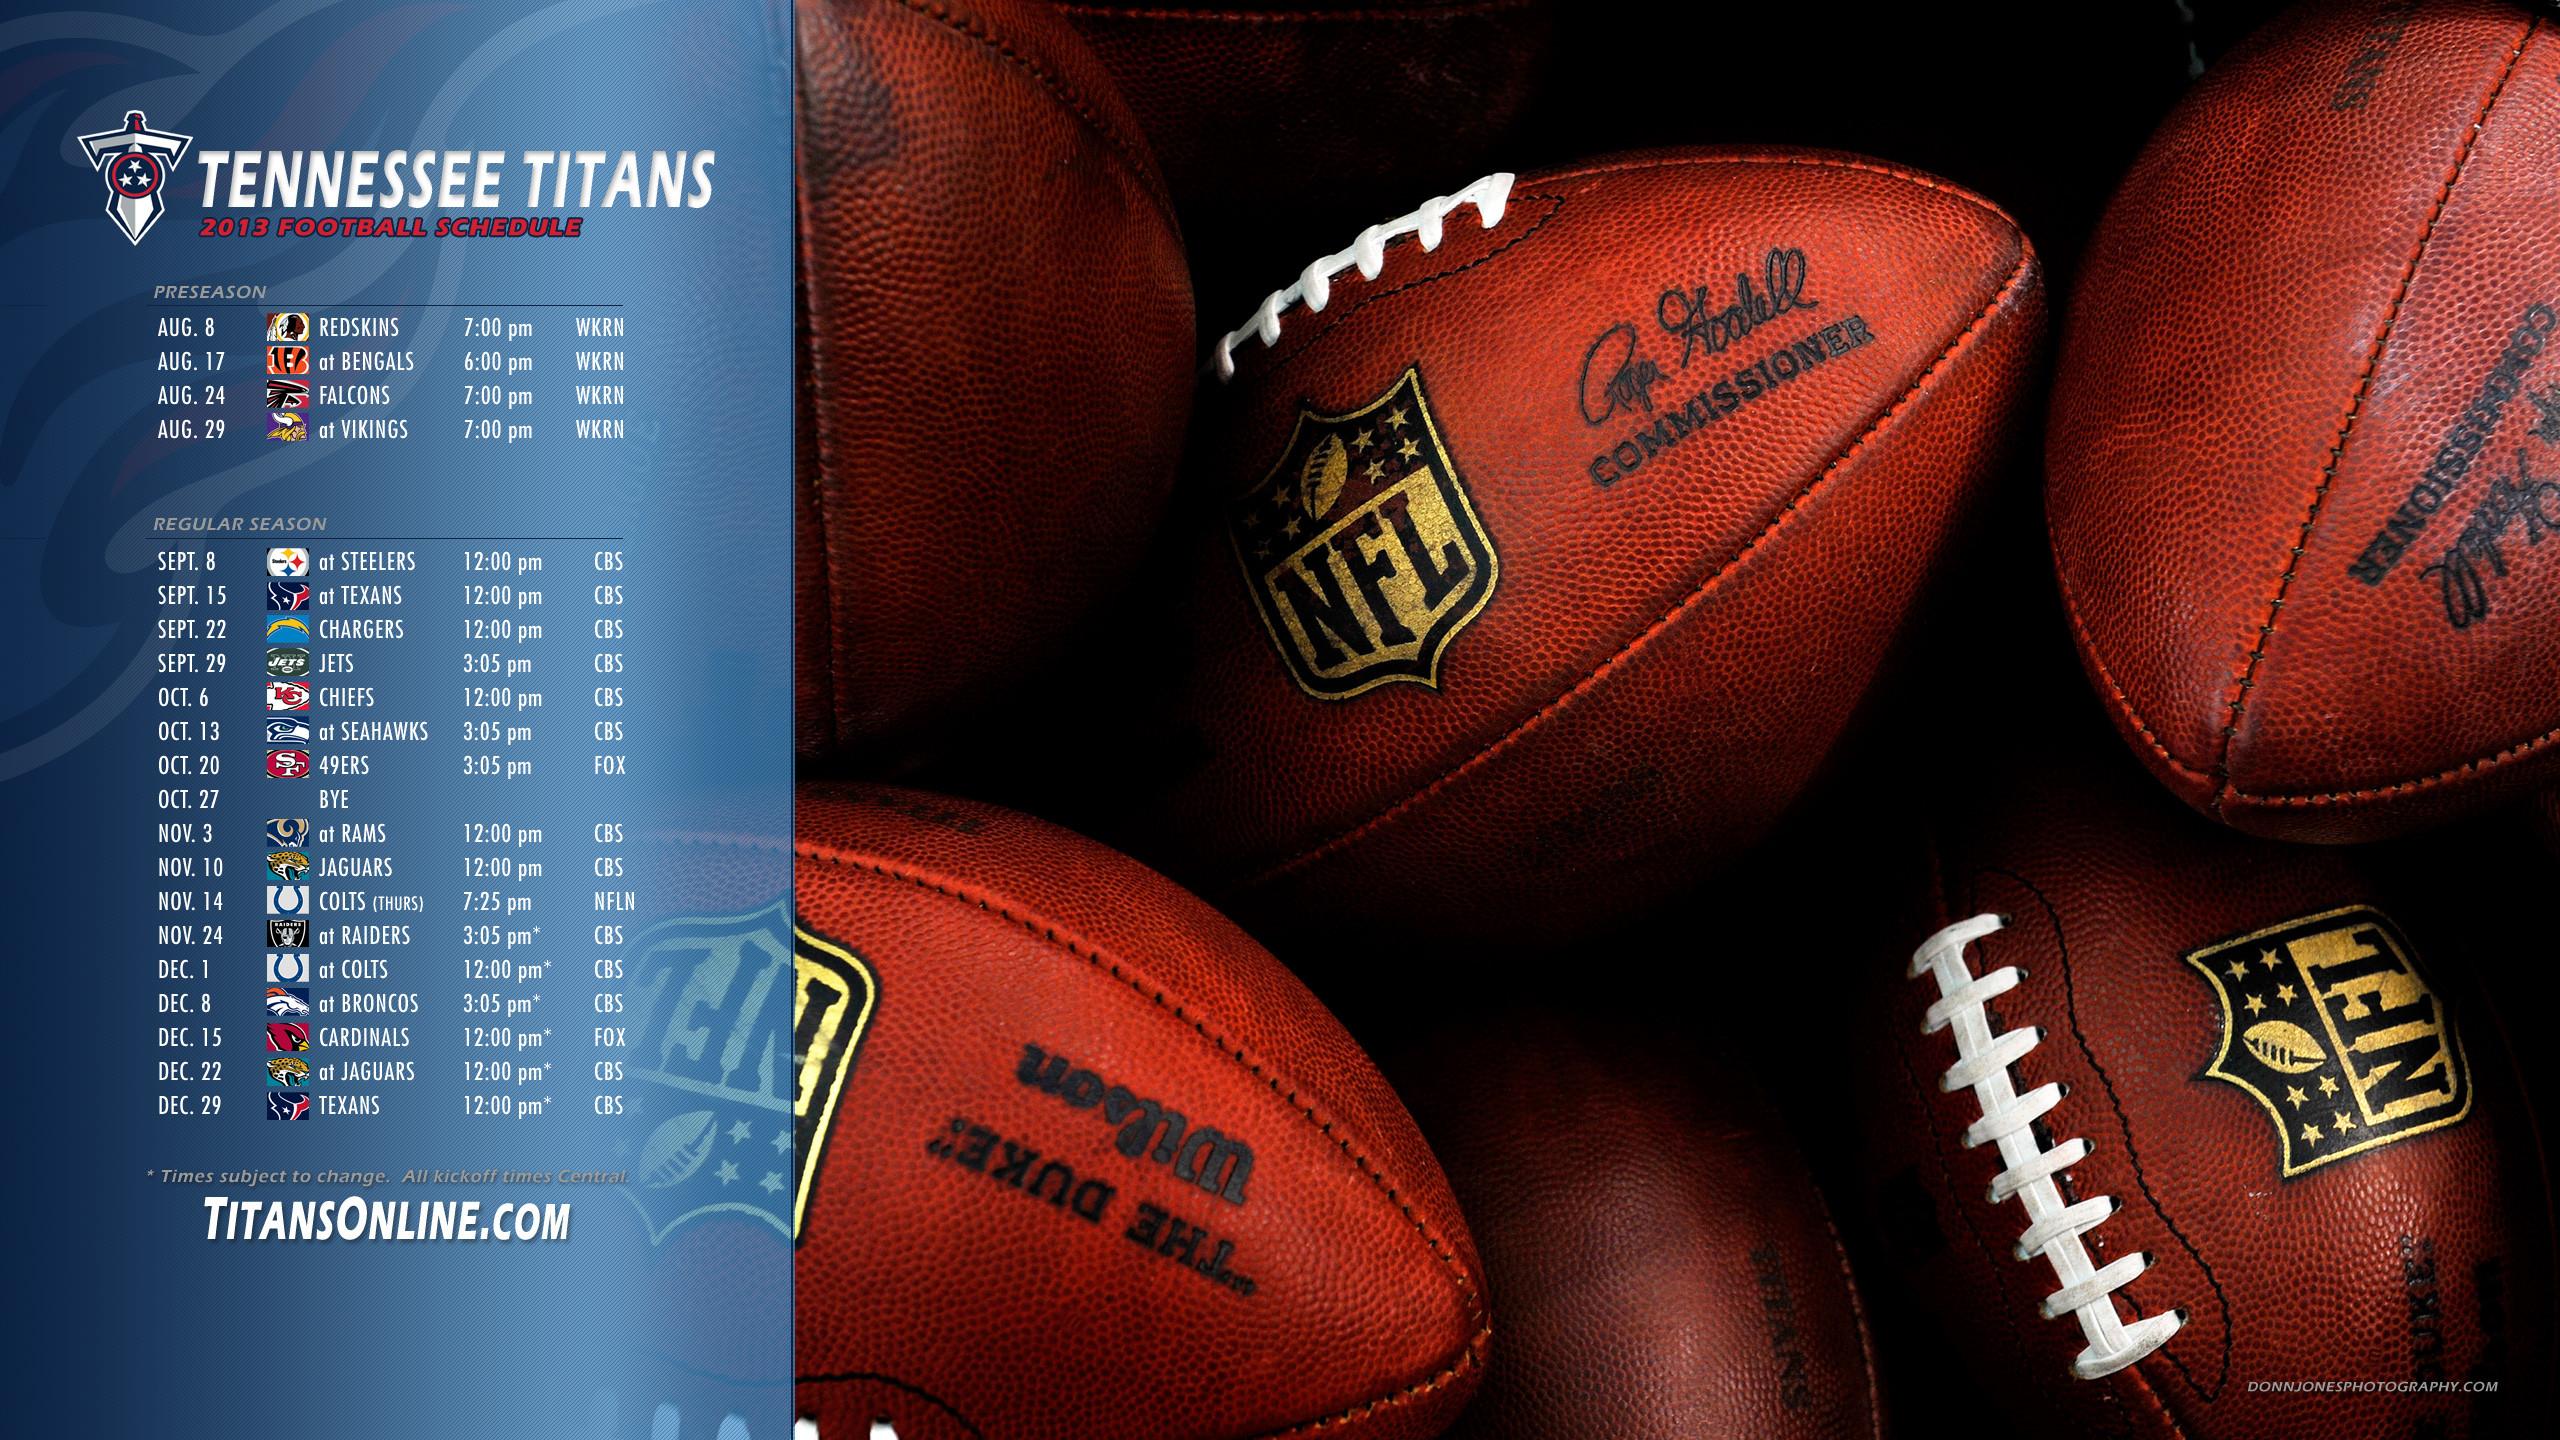 Tennessee Titans | Downloadable Desktop Wallpaper